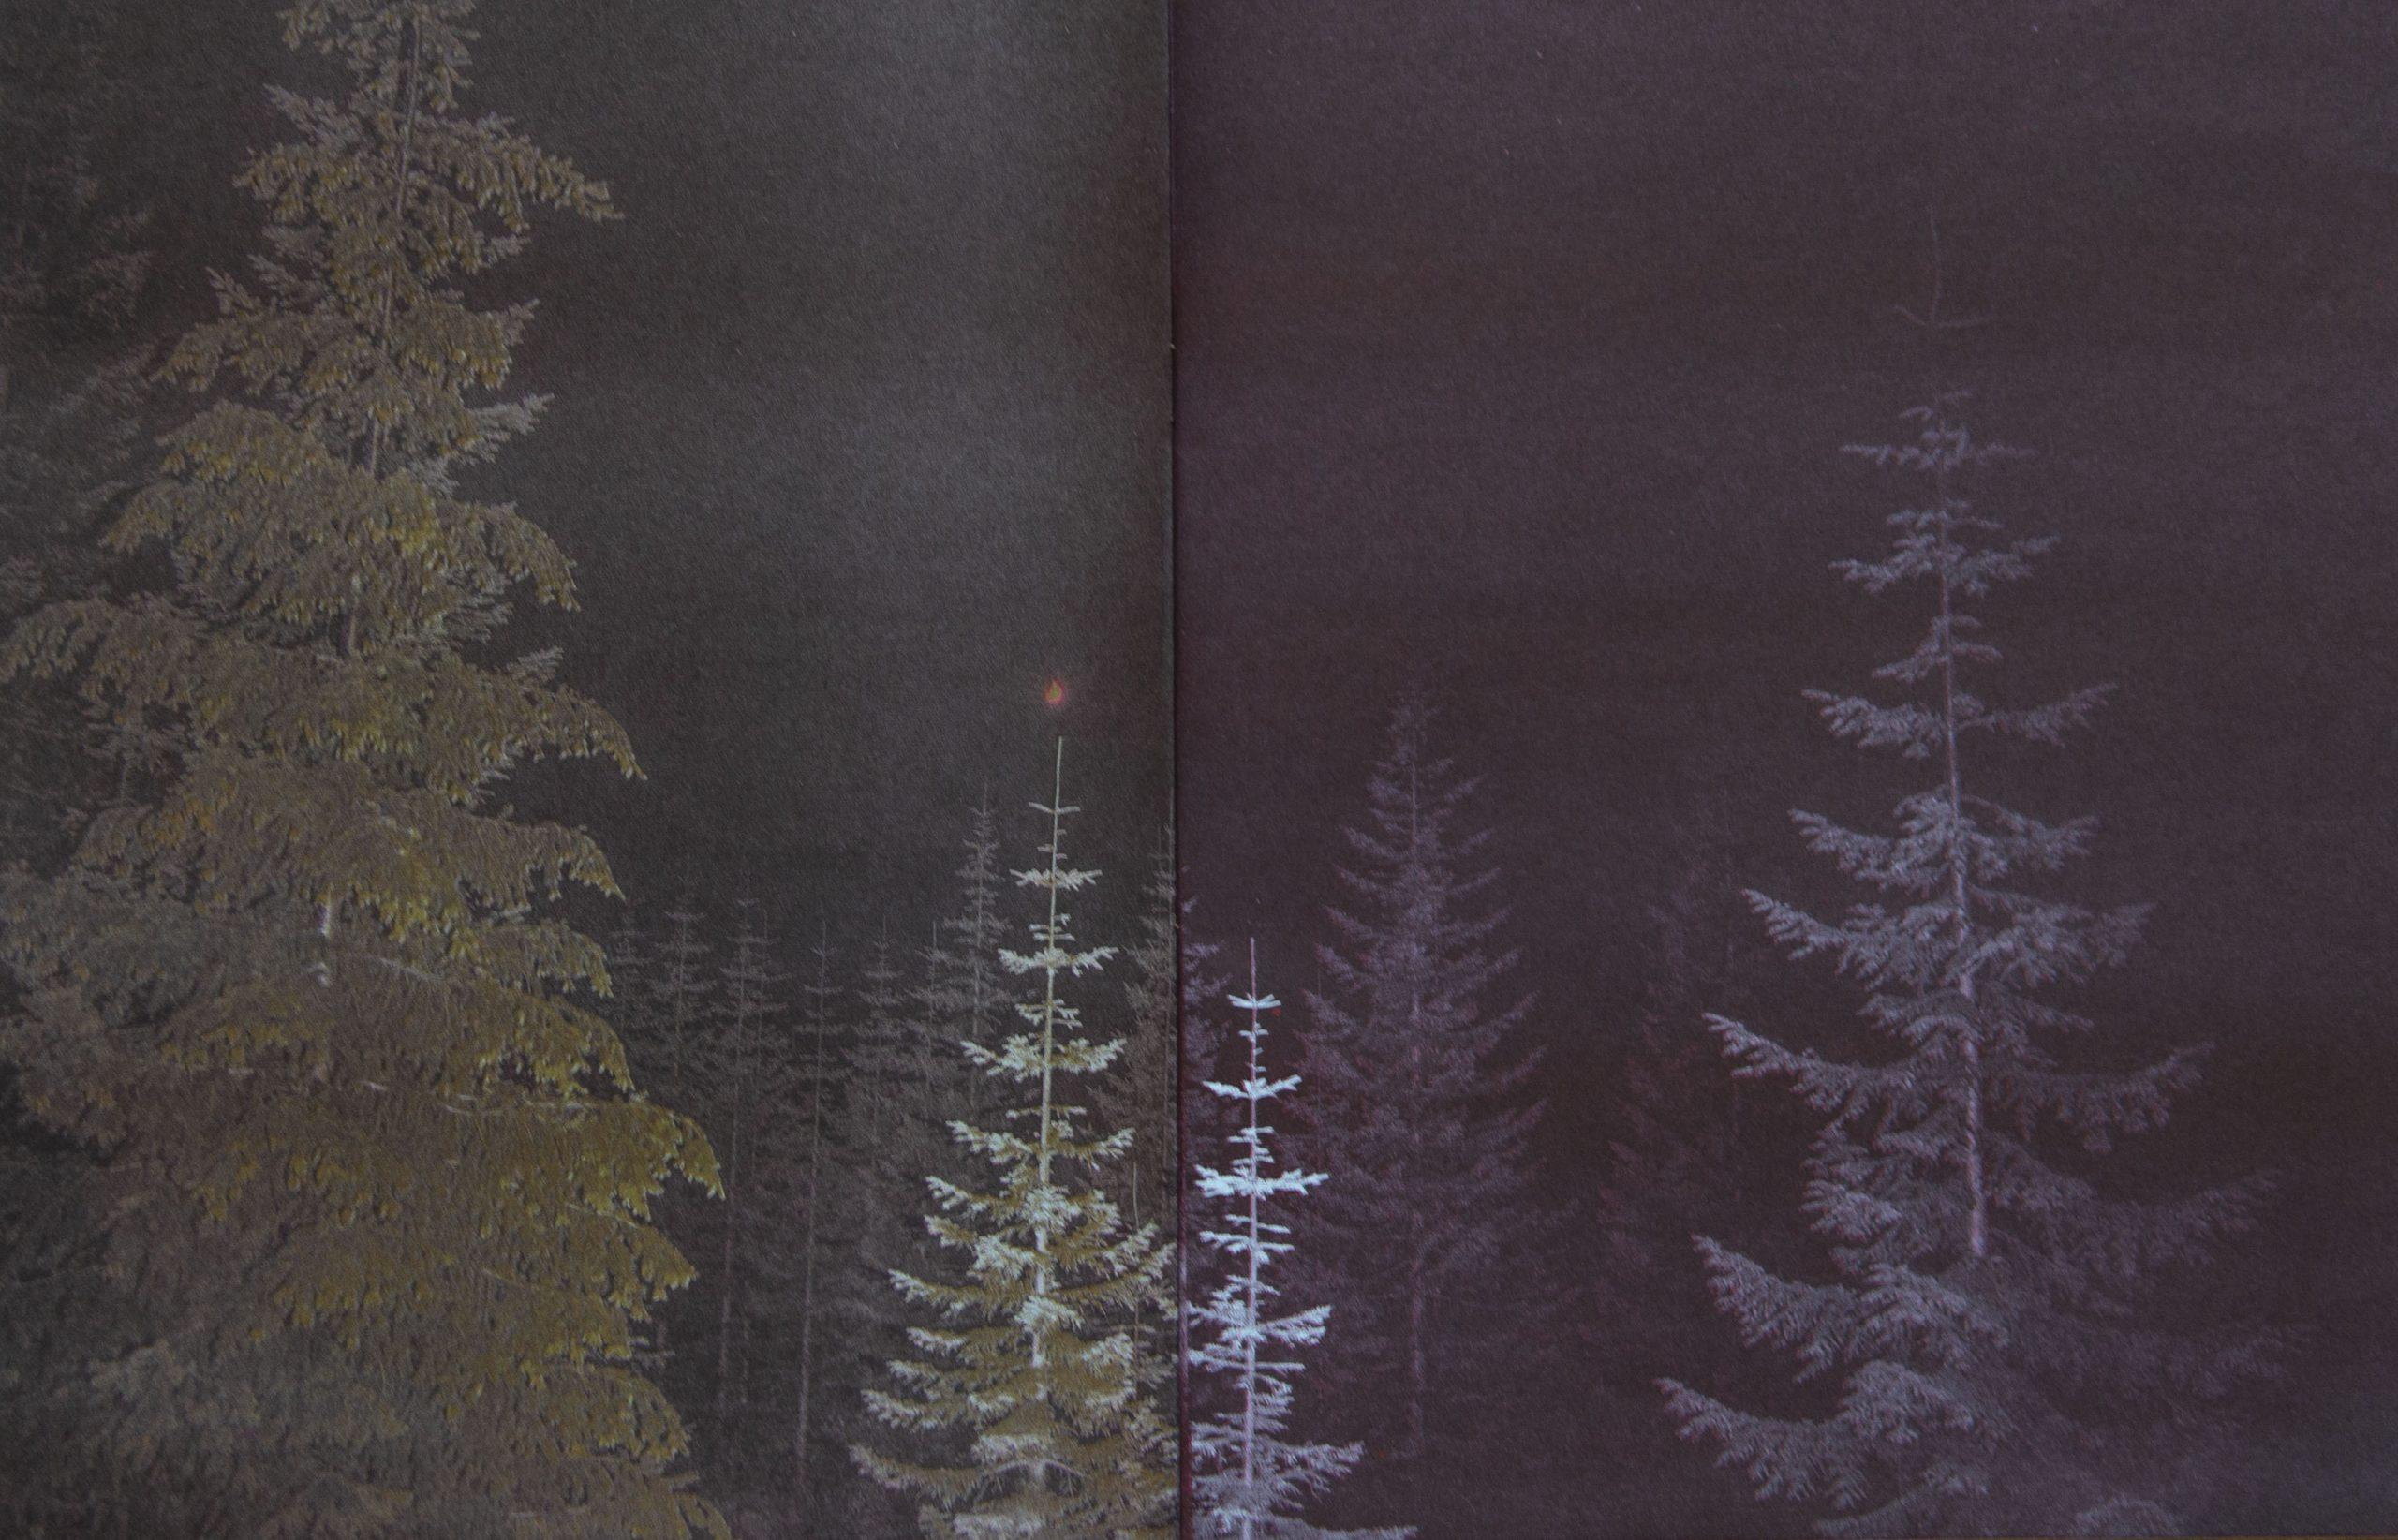 FireMoon,RisographDiptych25x41cm2019